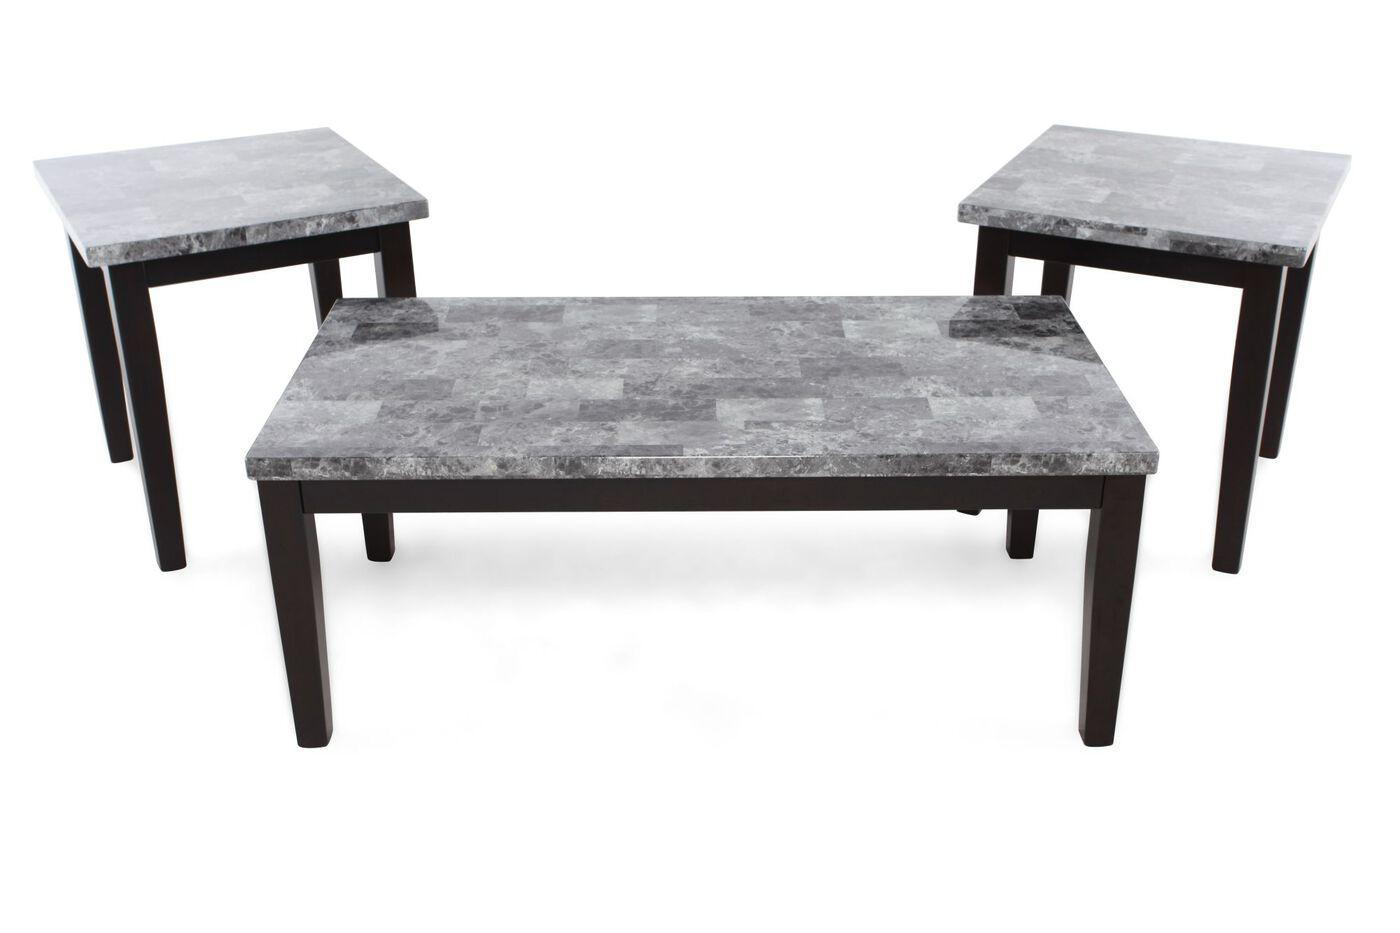 Ashley Furniture Maysville Table